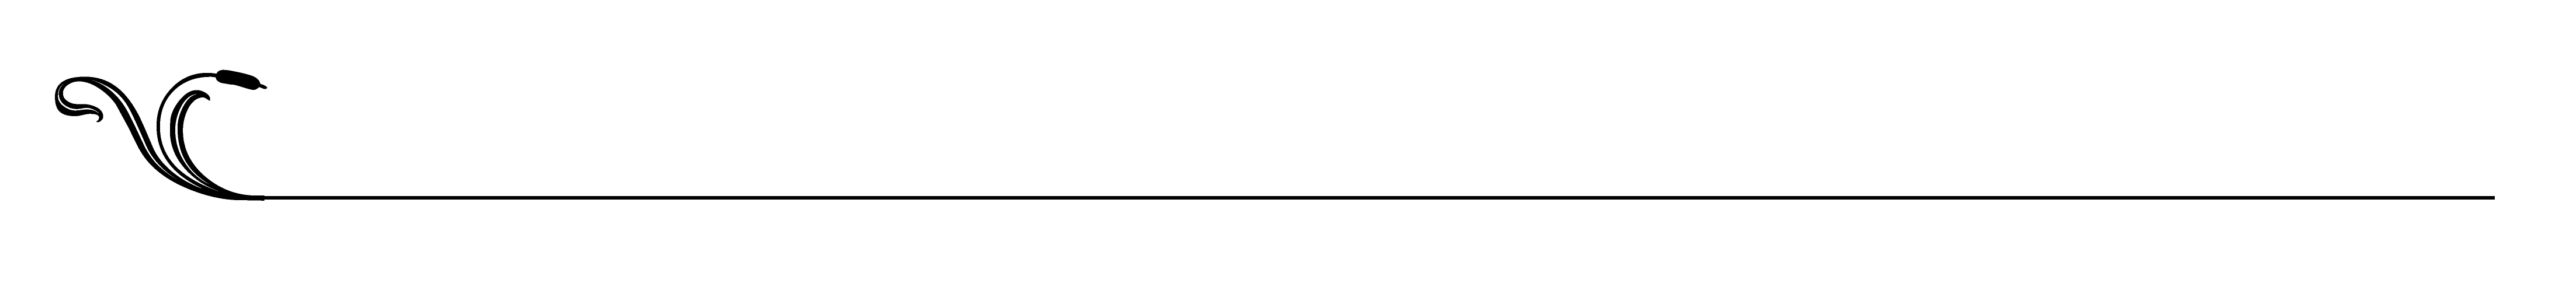 Index of familytree ftm. Flourishes clipart underlines